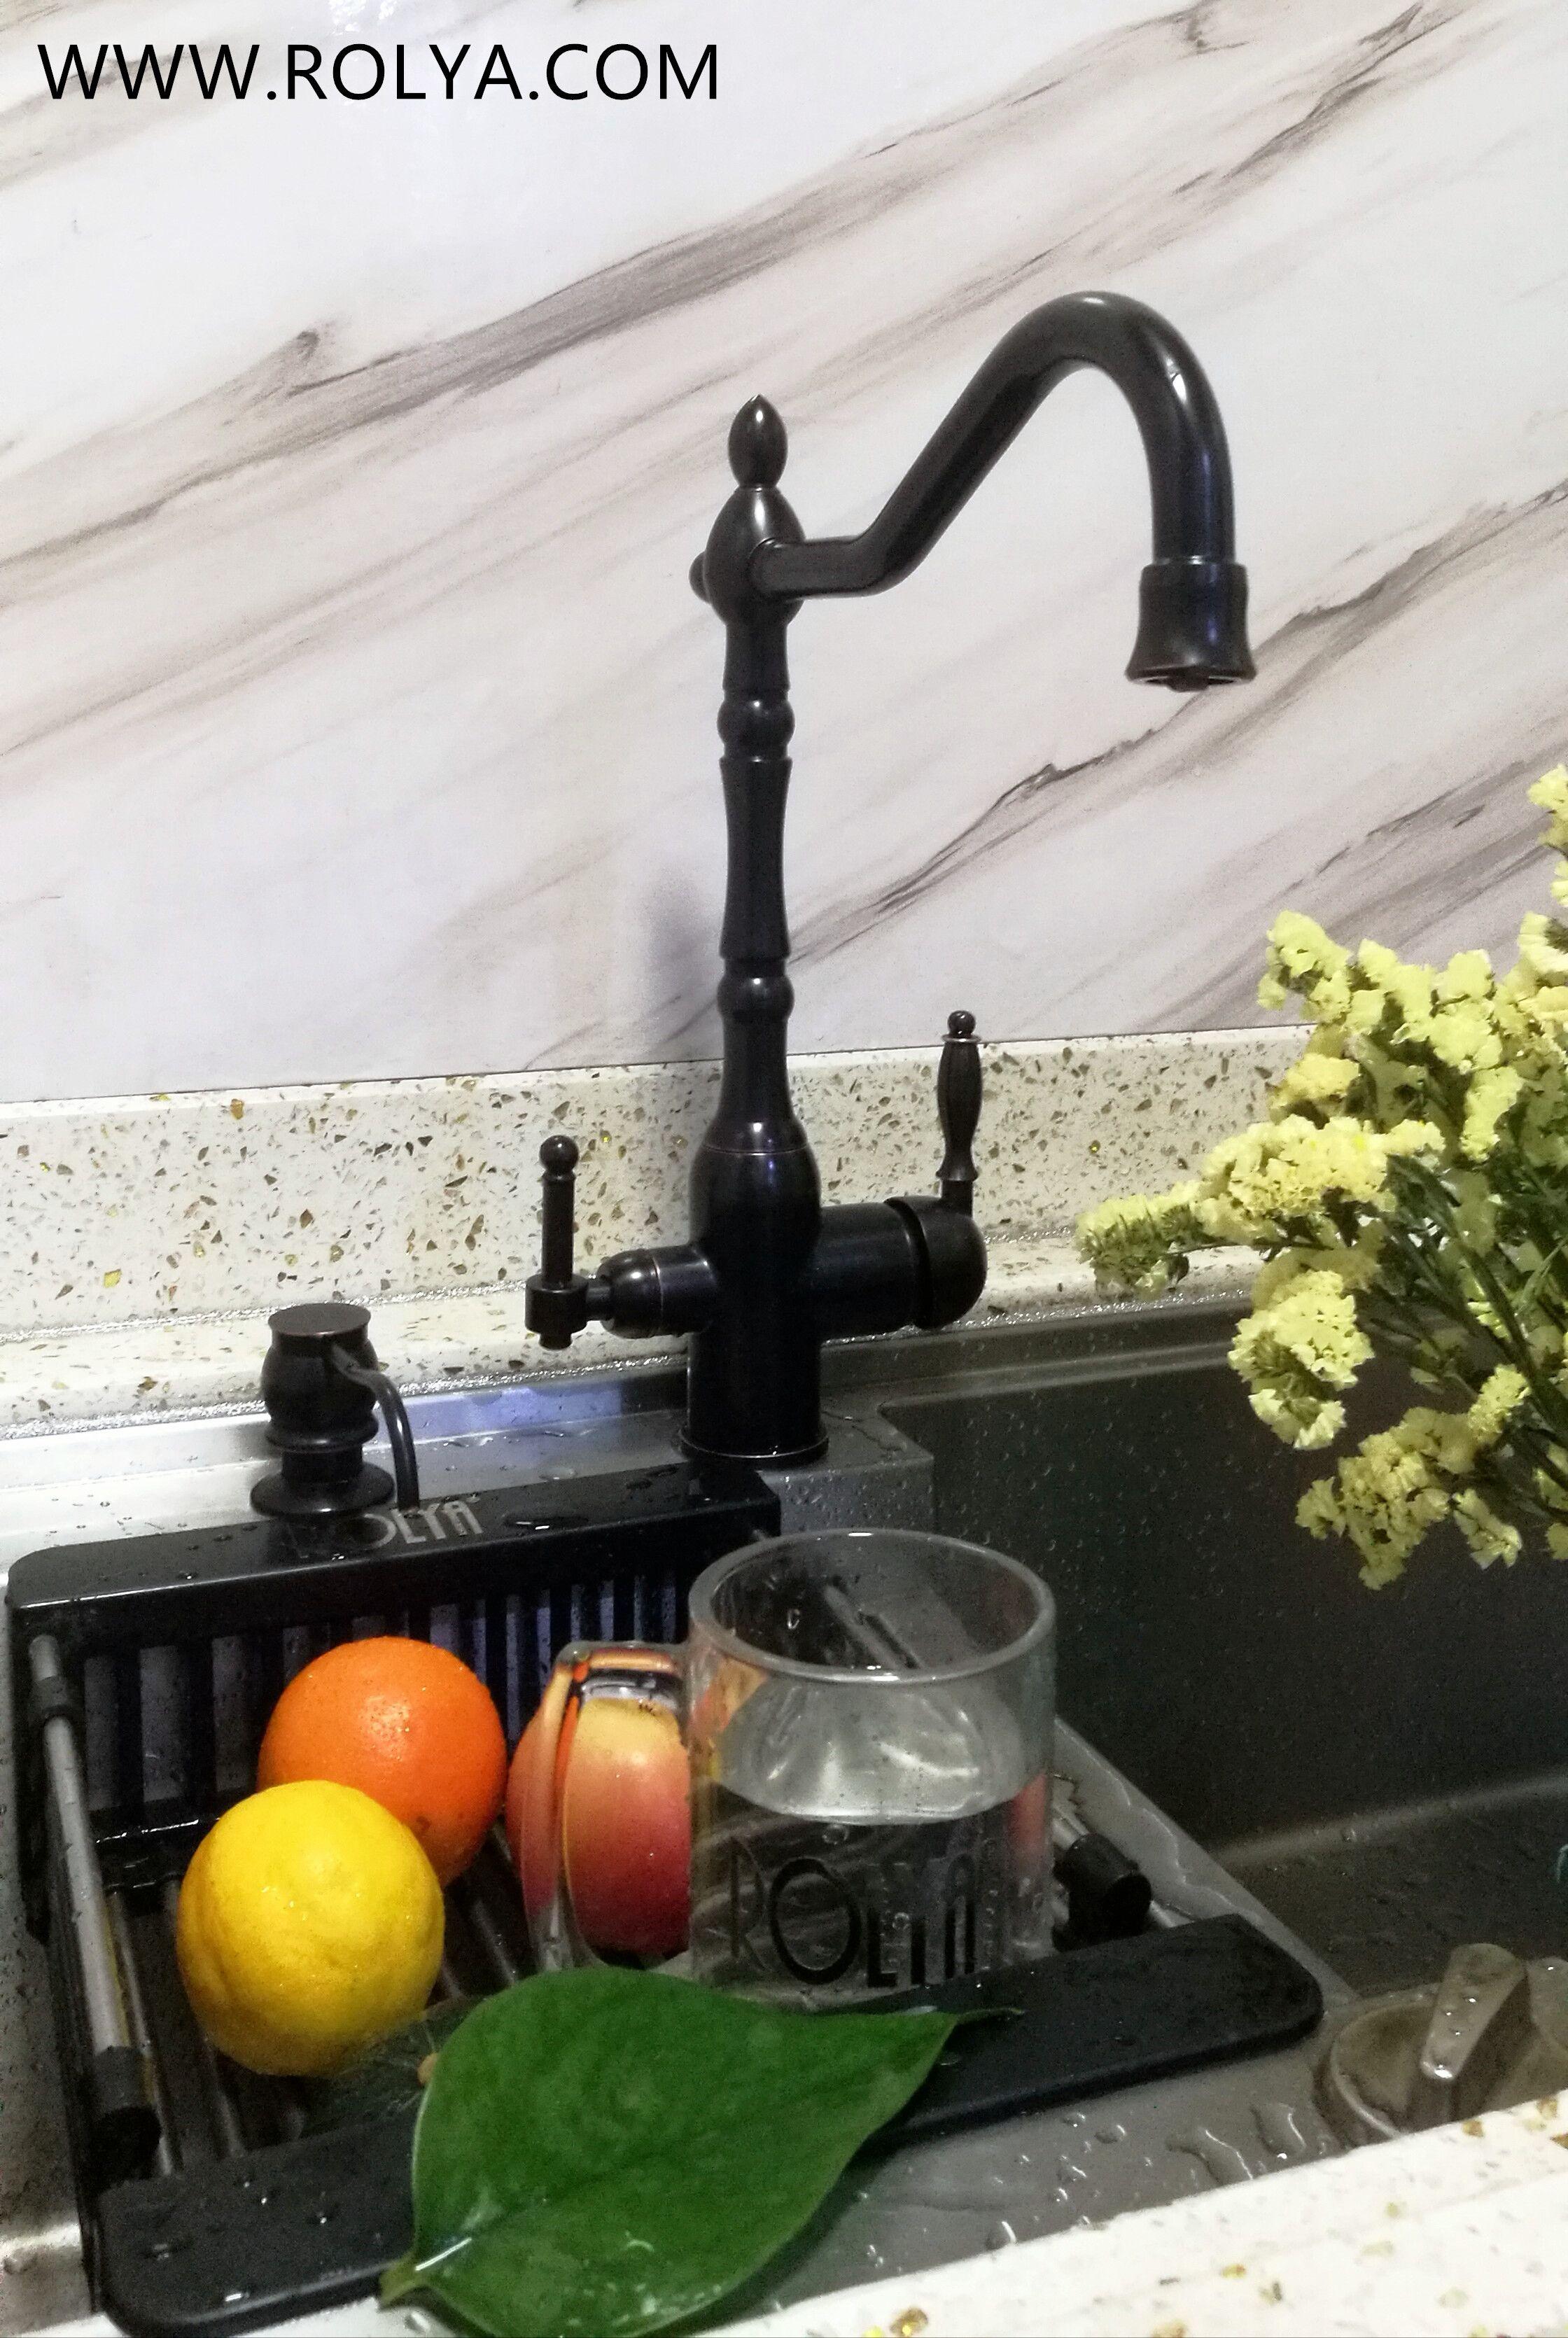 rolya vintage 3 way kitchen faucet oil